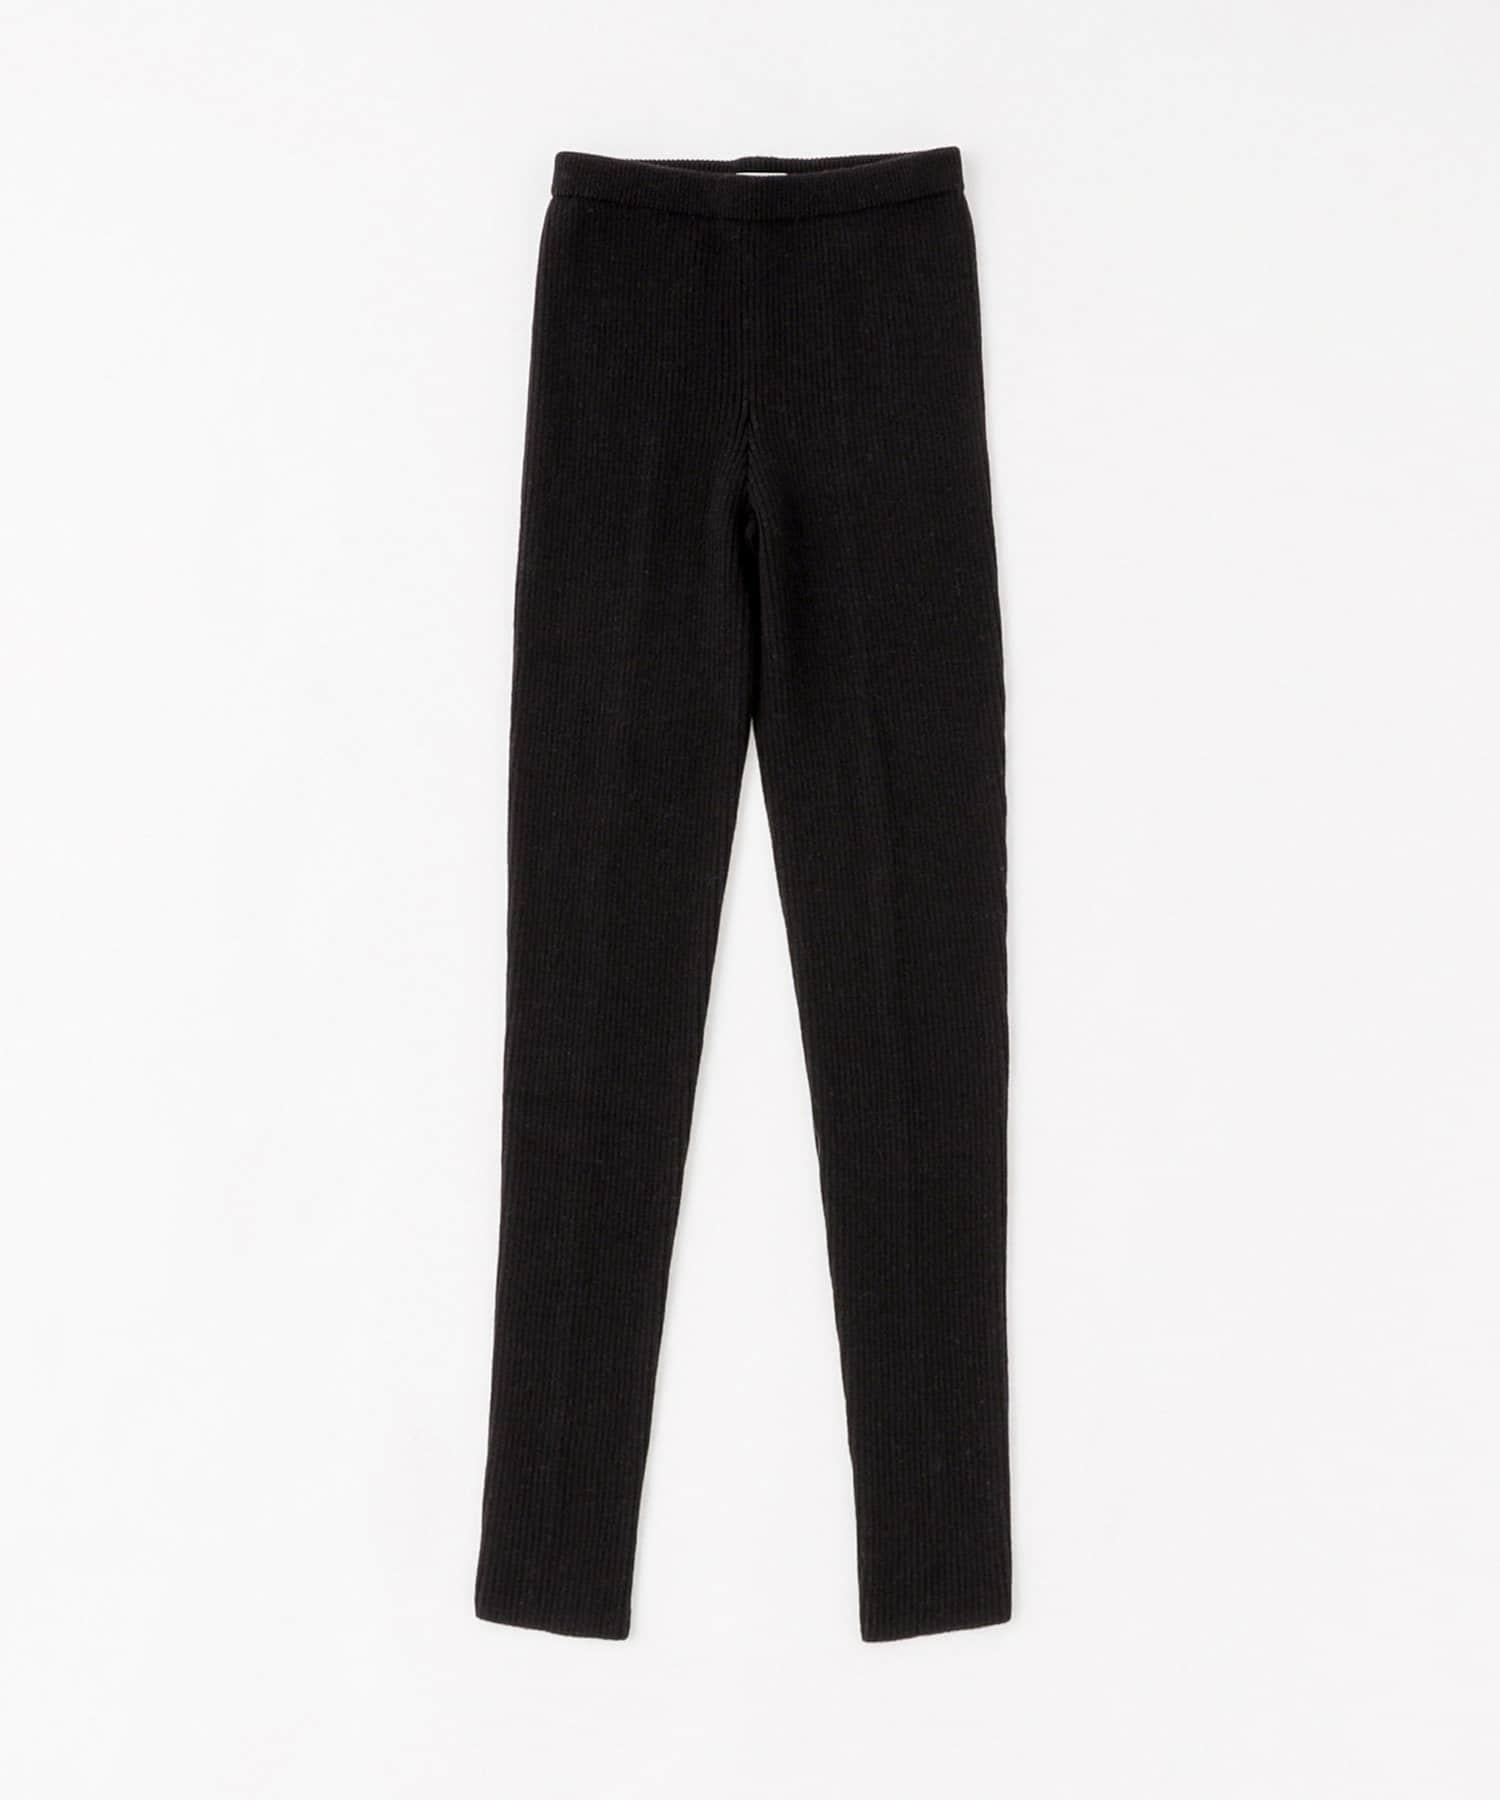 BLOOM&BRANCH(ブルームアンドブランチ) Phlannèl / Wool Knit Rib Pants